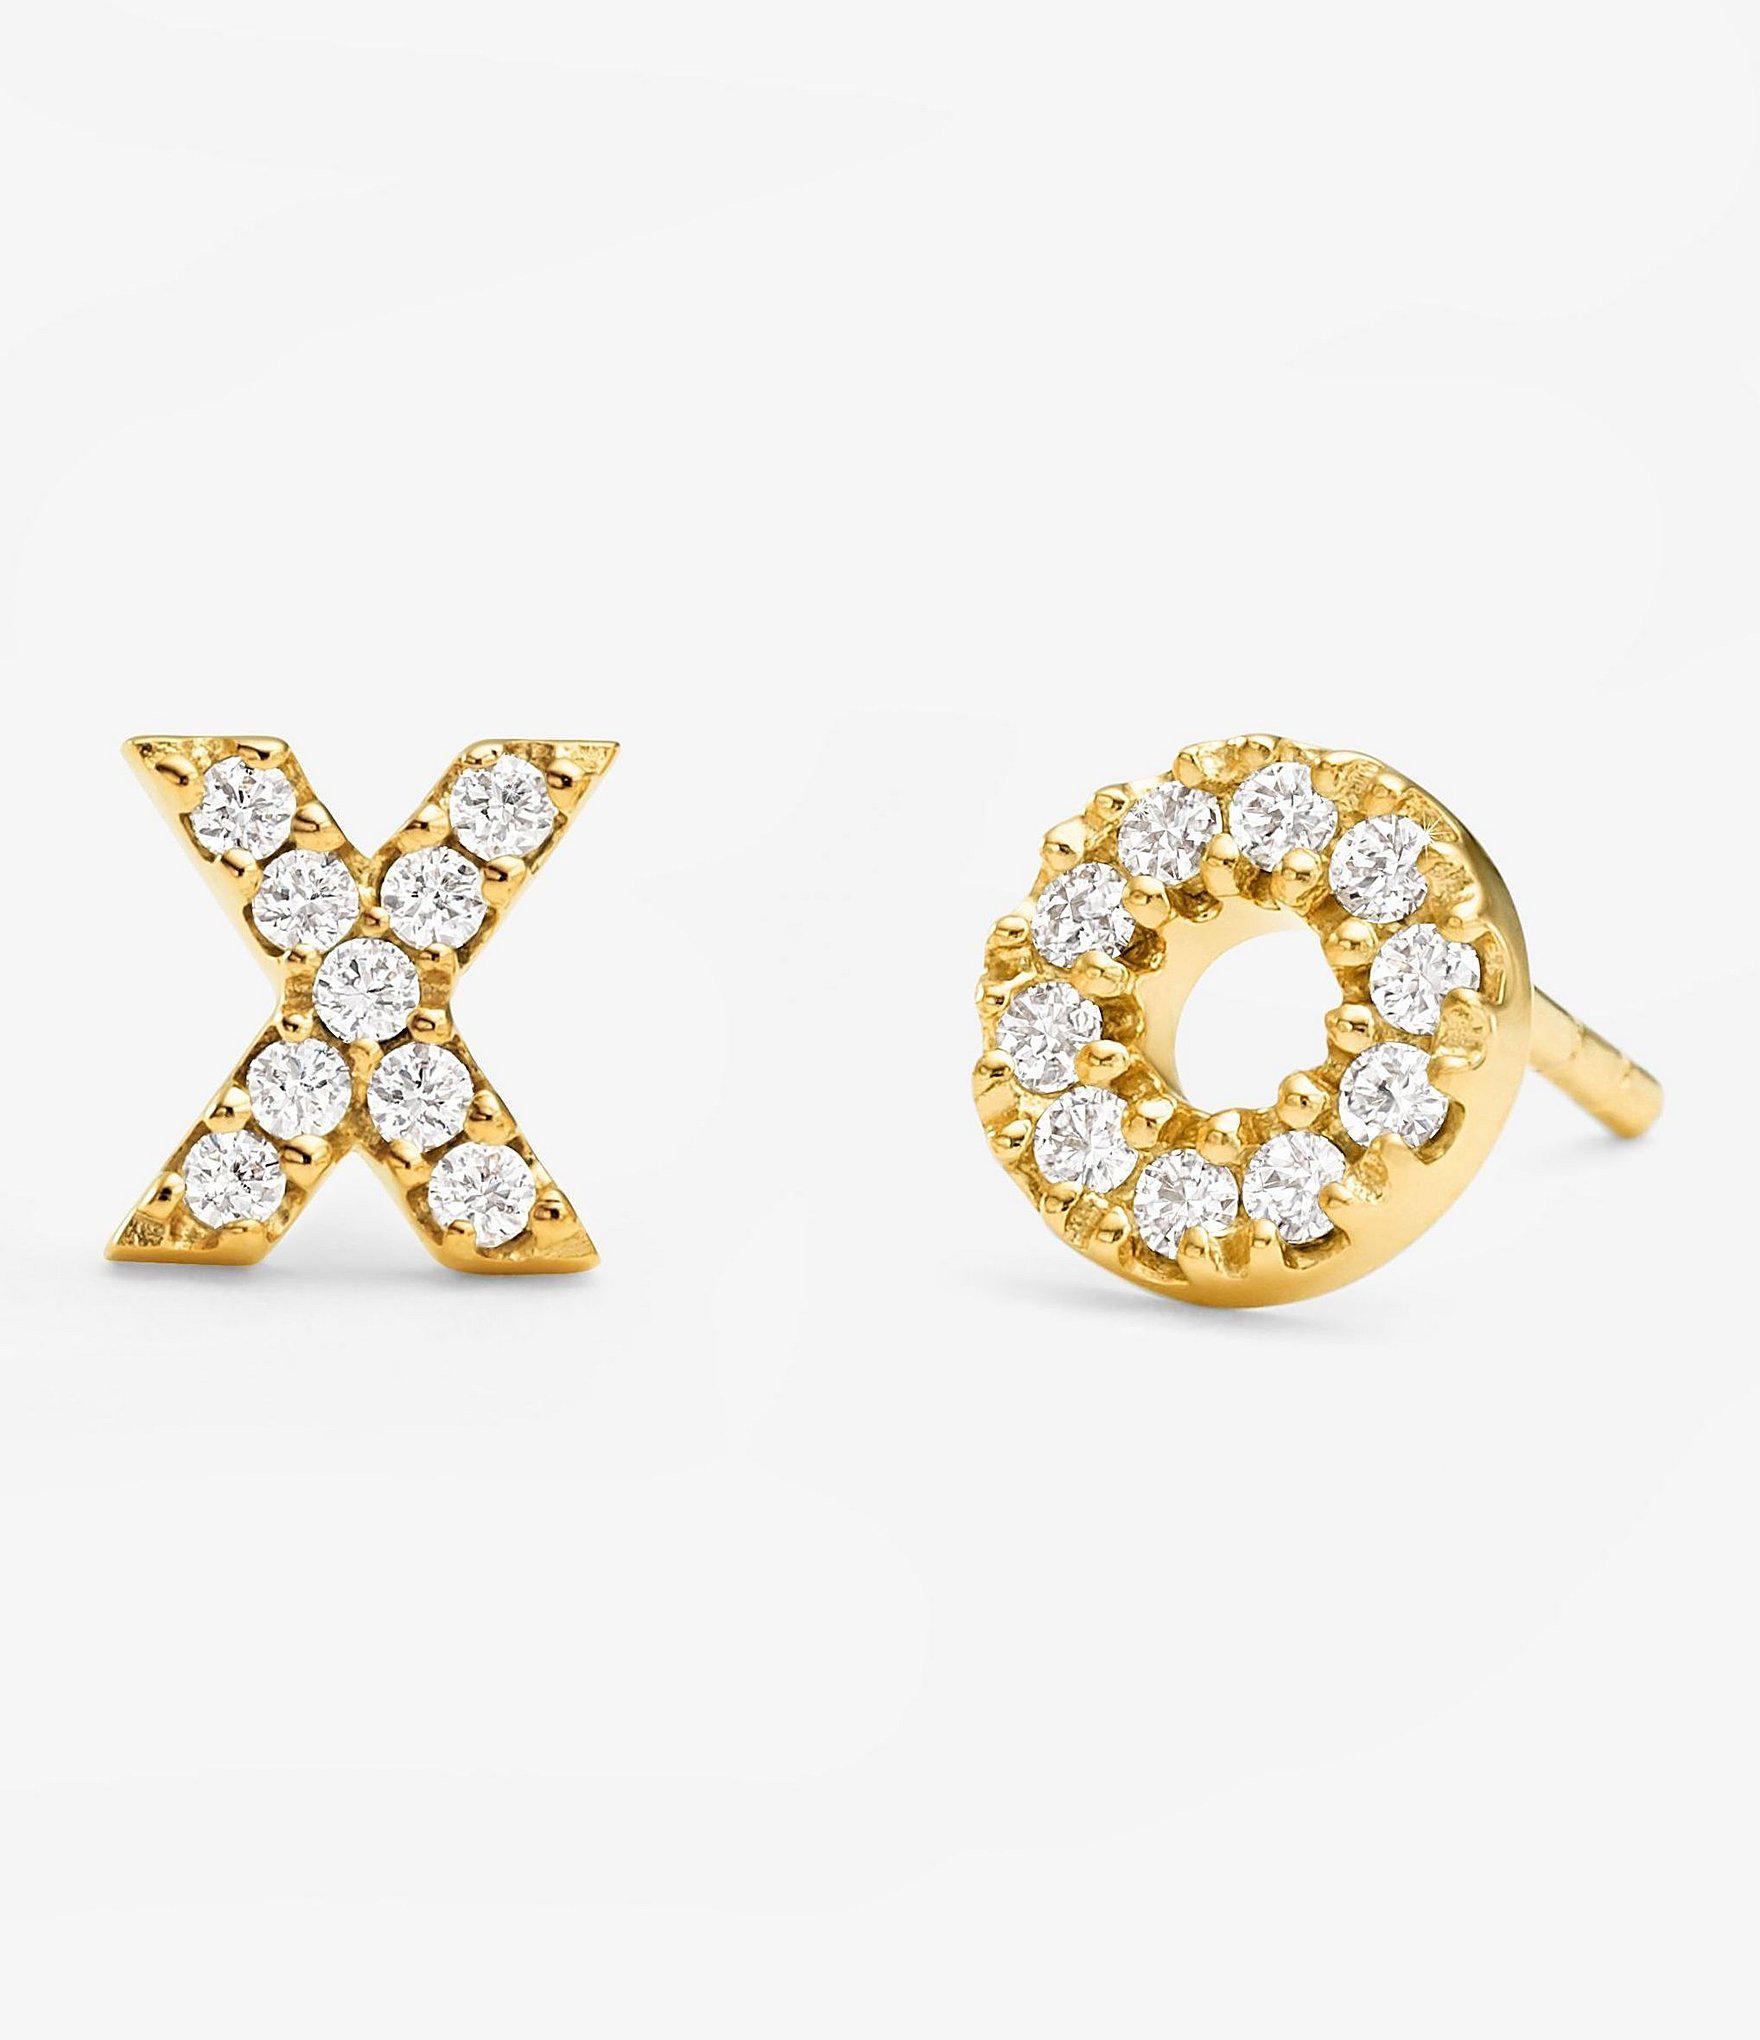 943b86cd2ad99 Michael Kors Metallic Custom Kors Collection Sterling Silver X And O Stud  Earrings